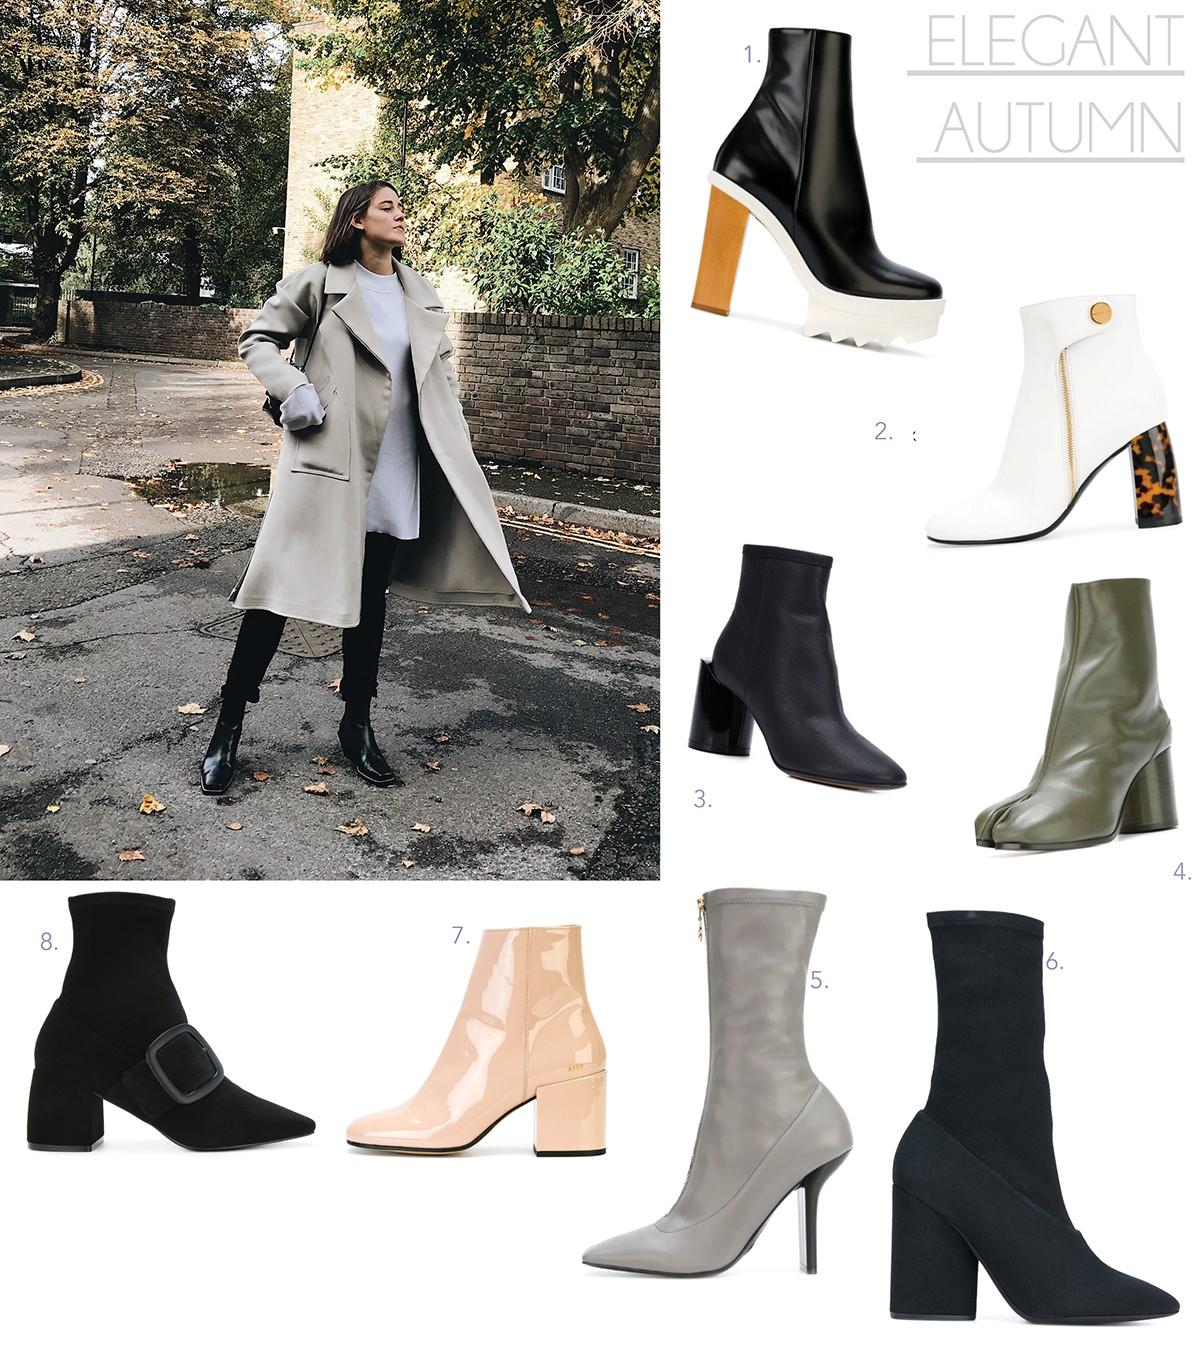 f6a714a74d9 Stella McCartney white tortoise boots 3. Maison Margiela extended ankle  boots 4. Maison Margiela khaki tabi boots 5. Stella McCartney grey sock  pumps 6.